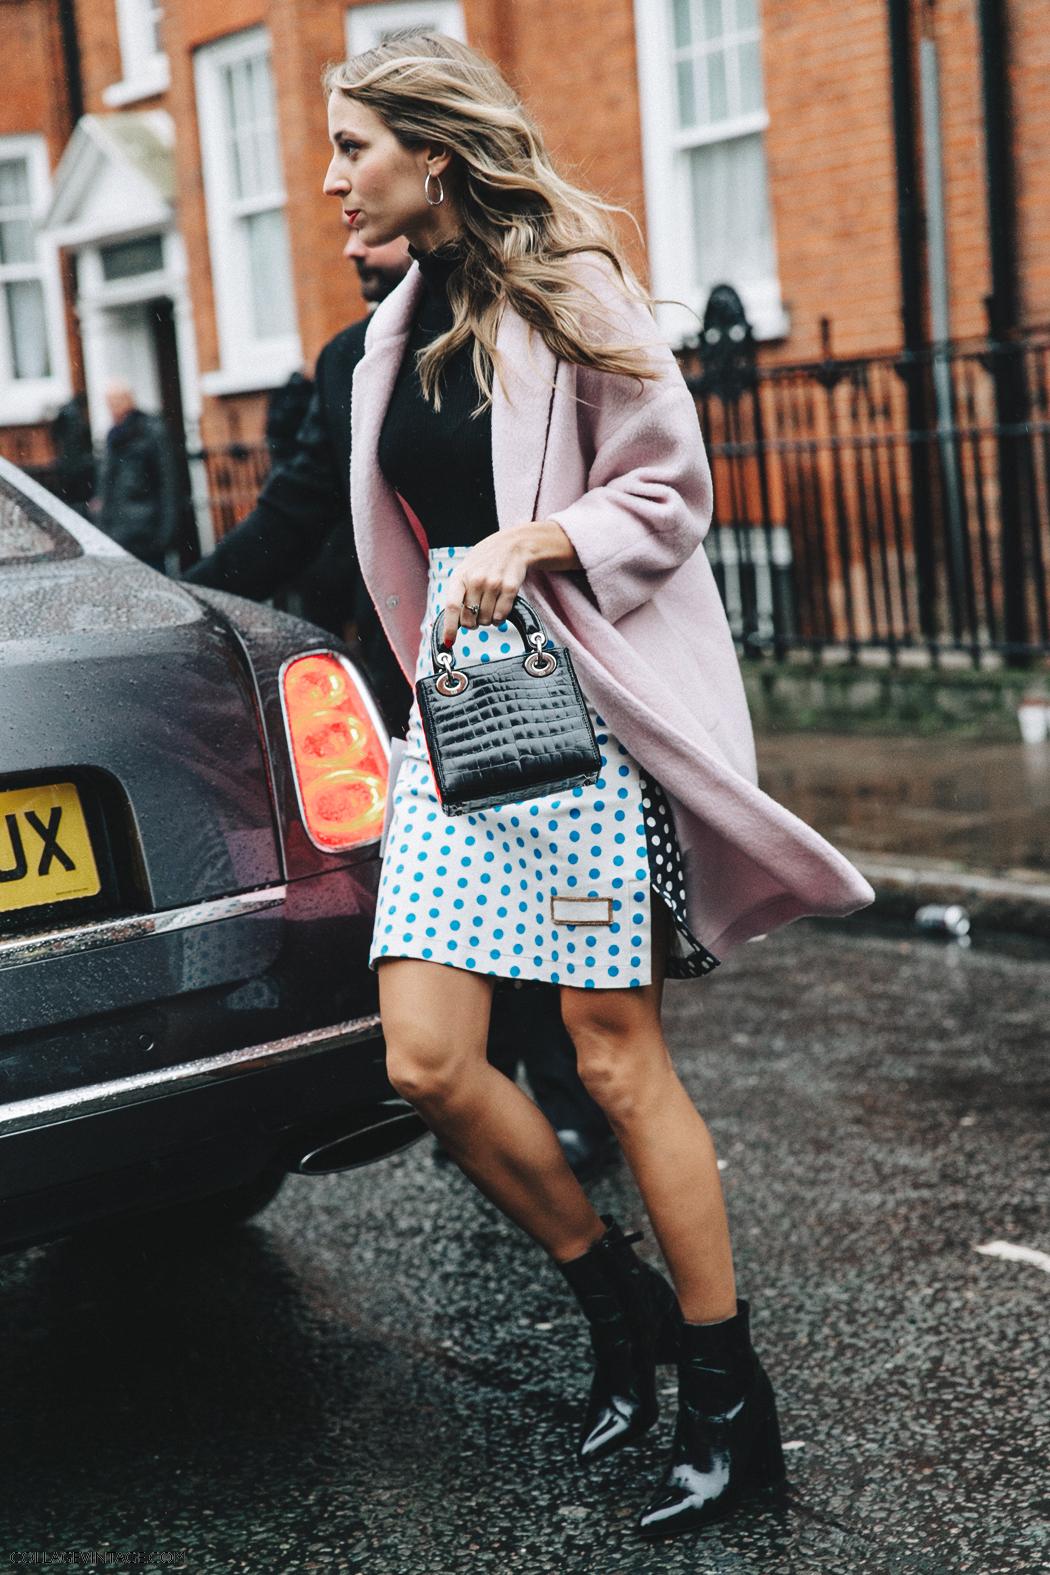 LFW-London_Fashion_Week_Fall_16-Street_Style-Collage_Vintage-JW_Anderson-1